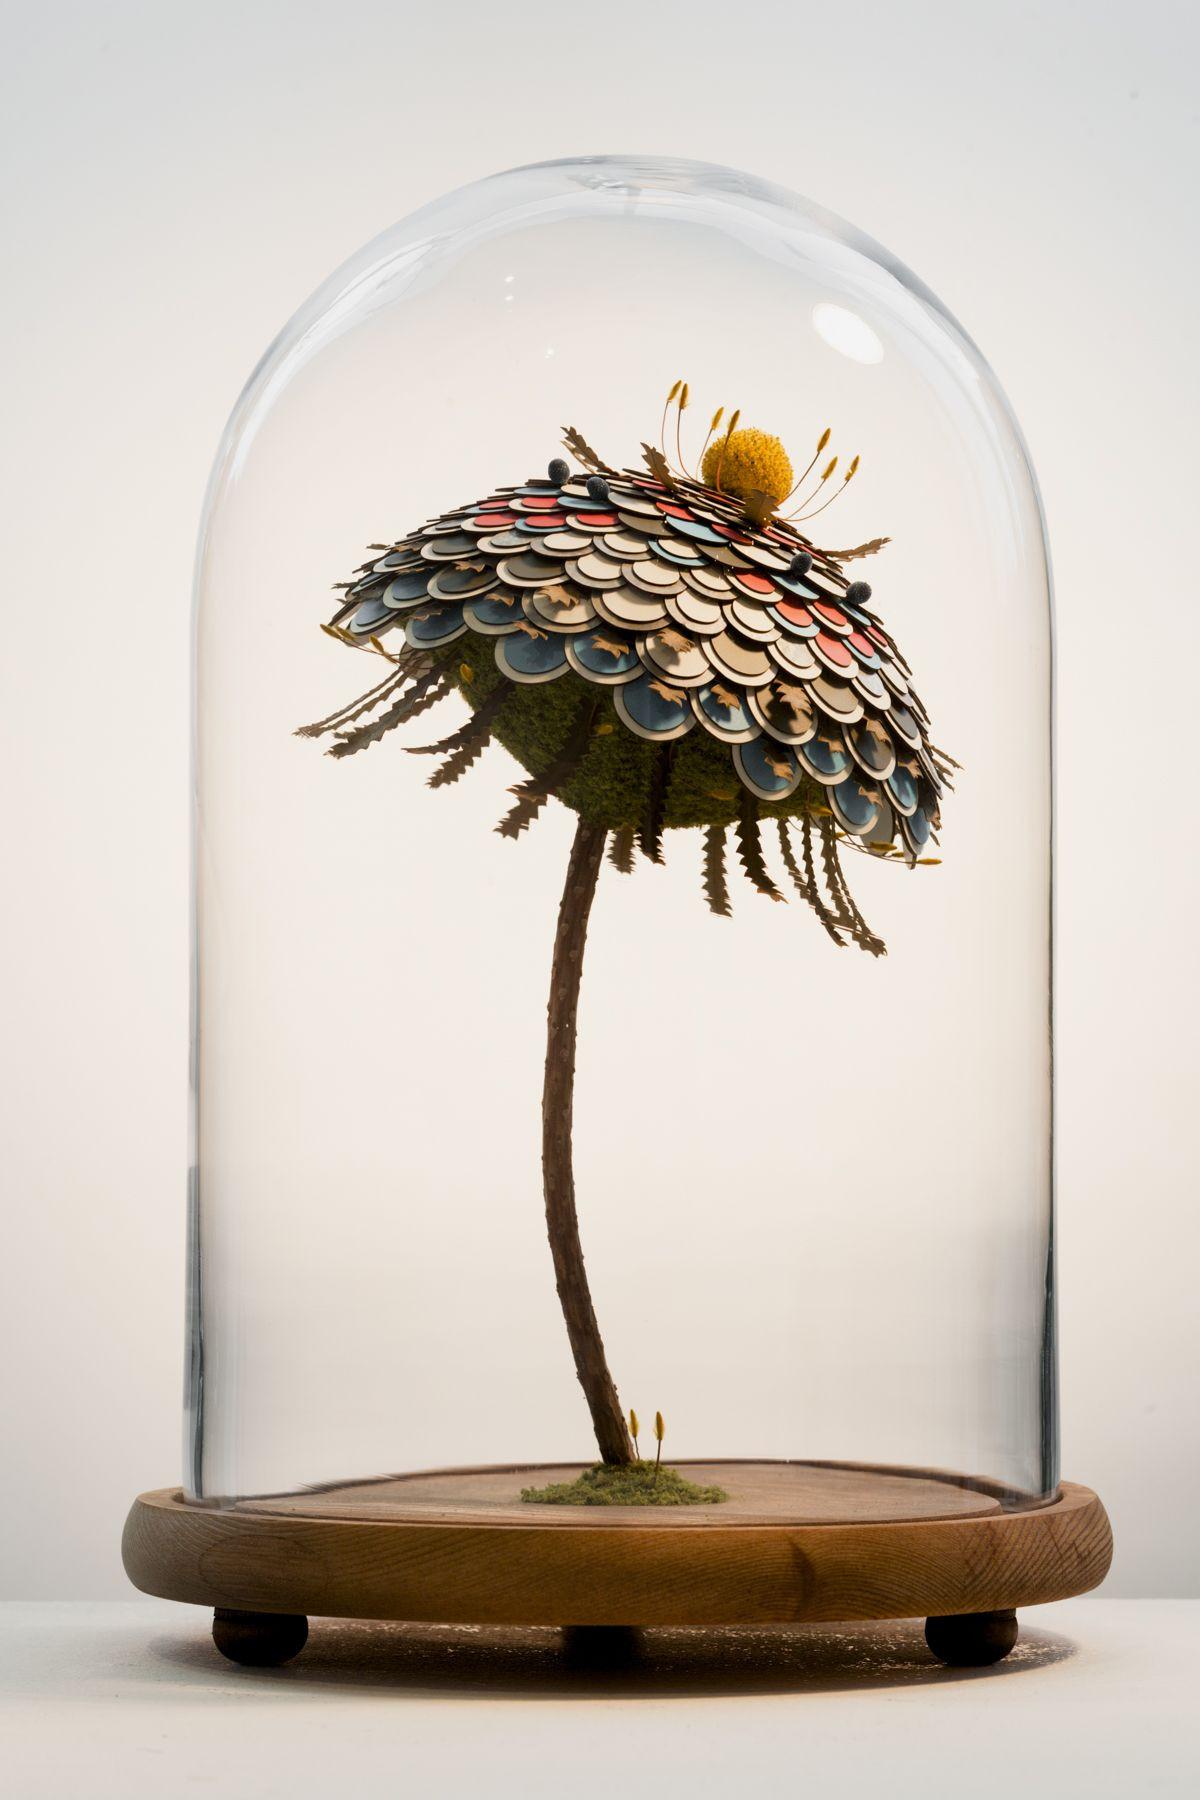 Mixed media art artwork craft design handmade nature paper sculpture surreal surrealism Noreen Loh Hui Miun